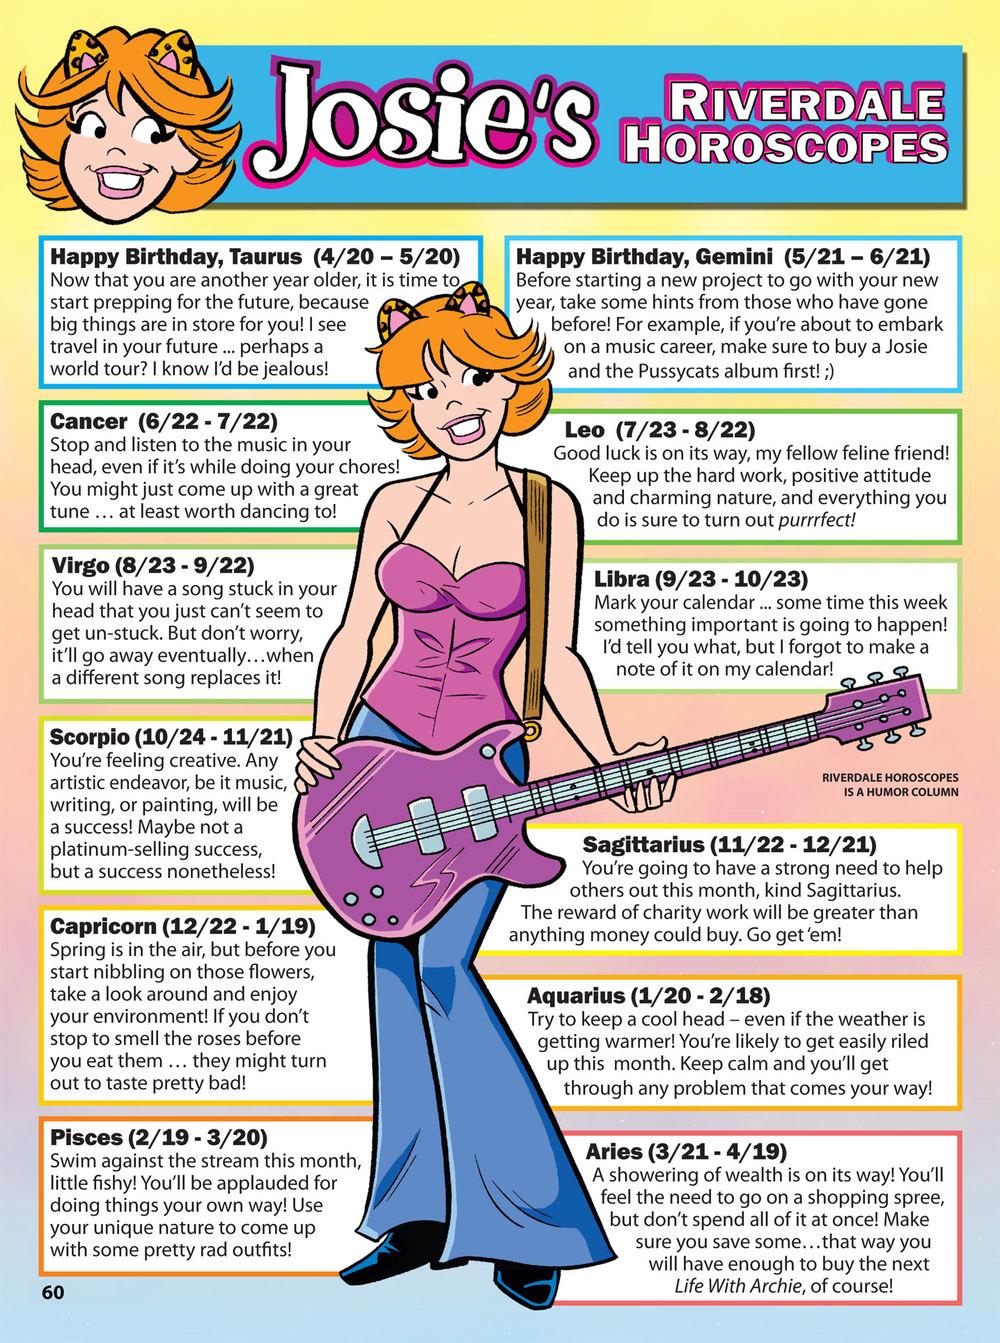 Josie's Riverdale Horoscopes